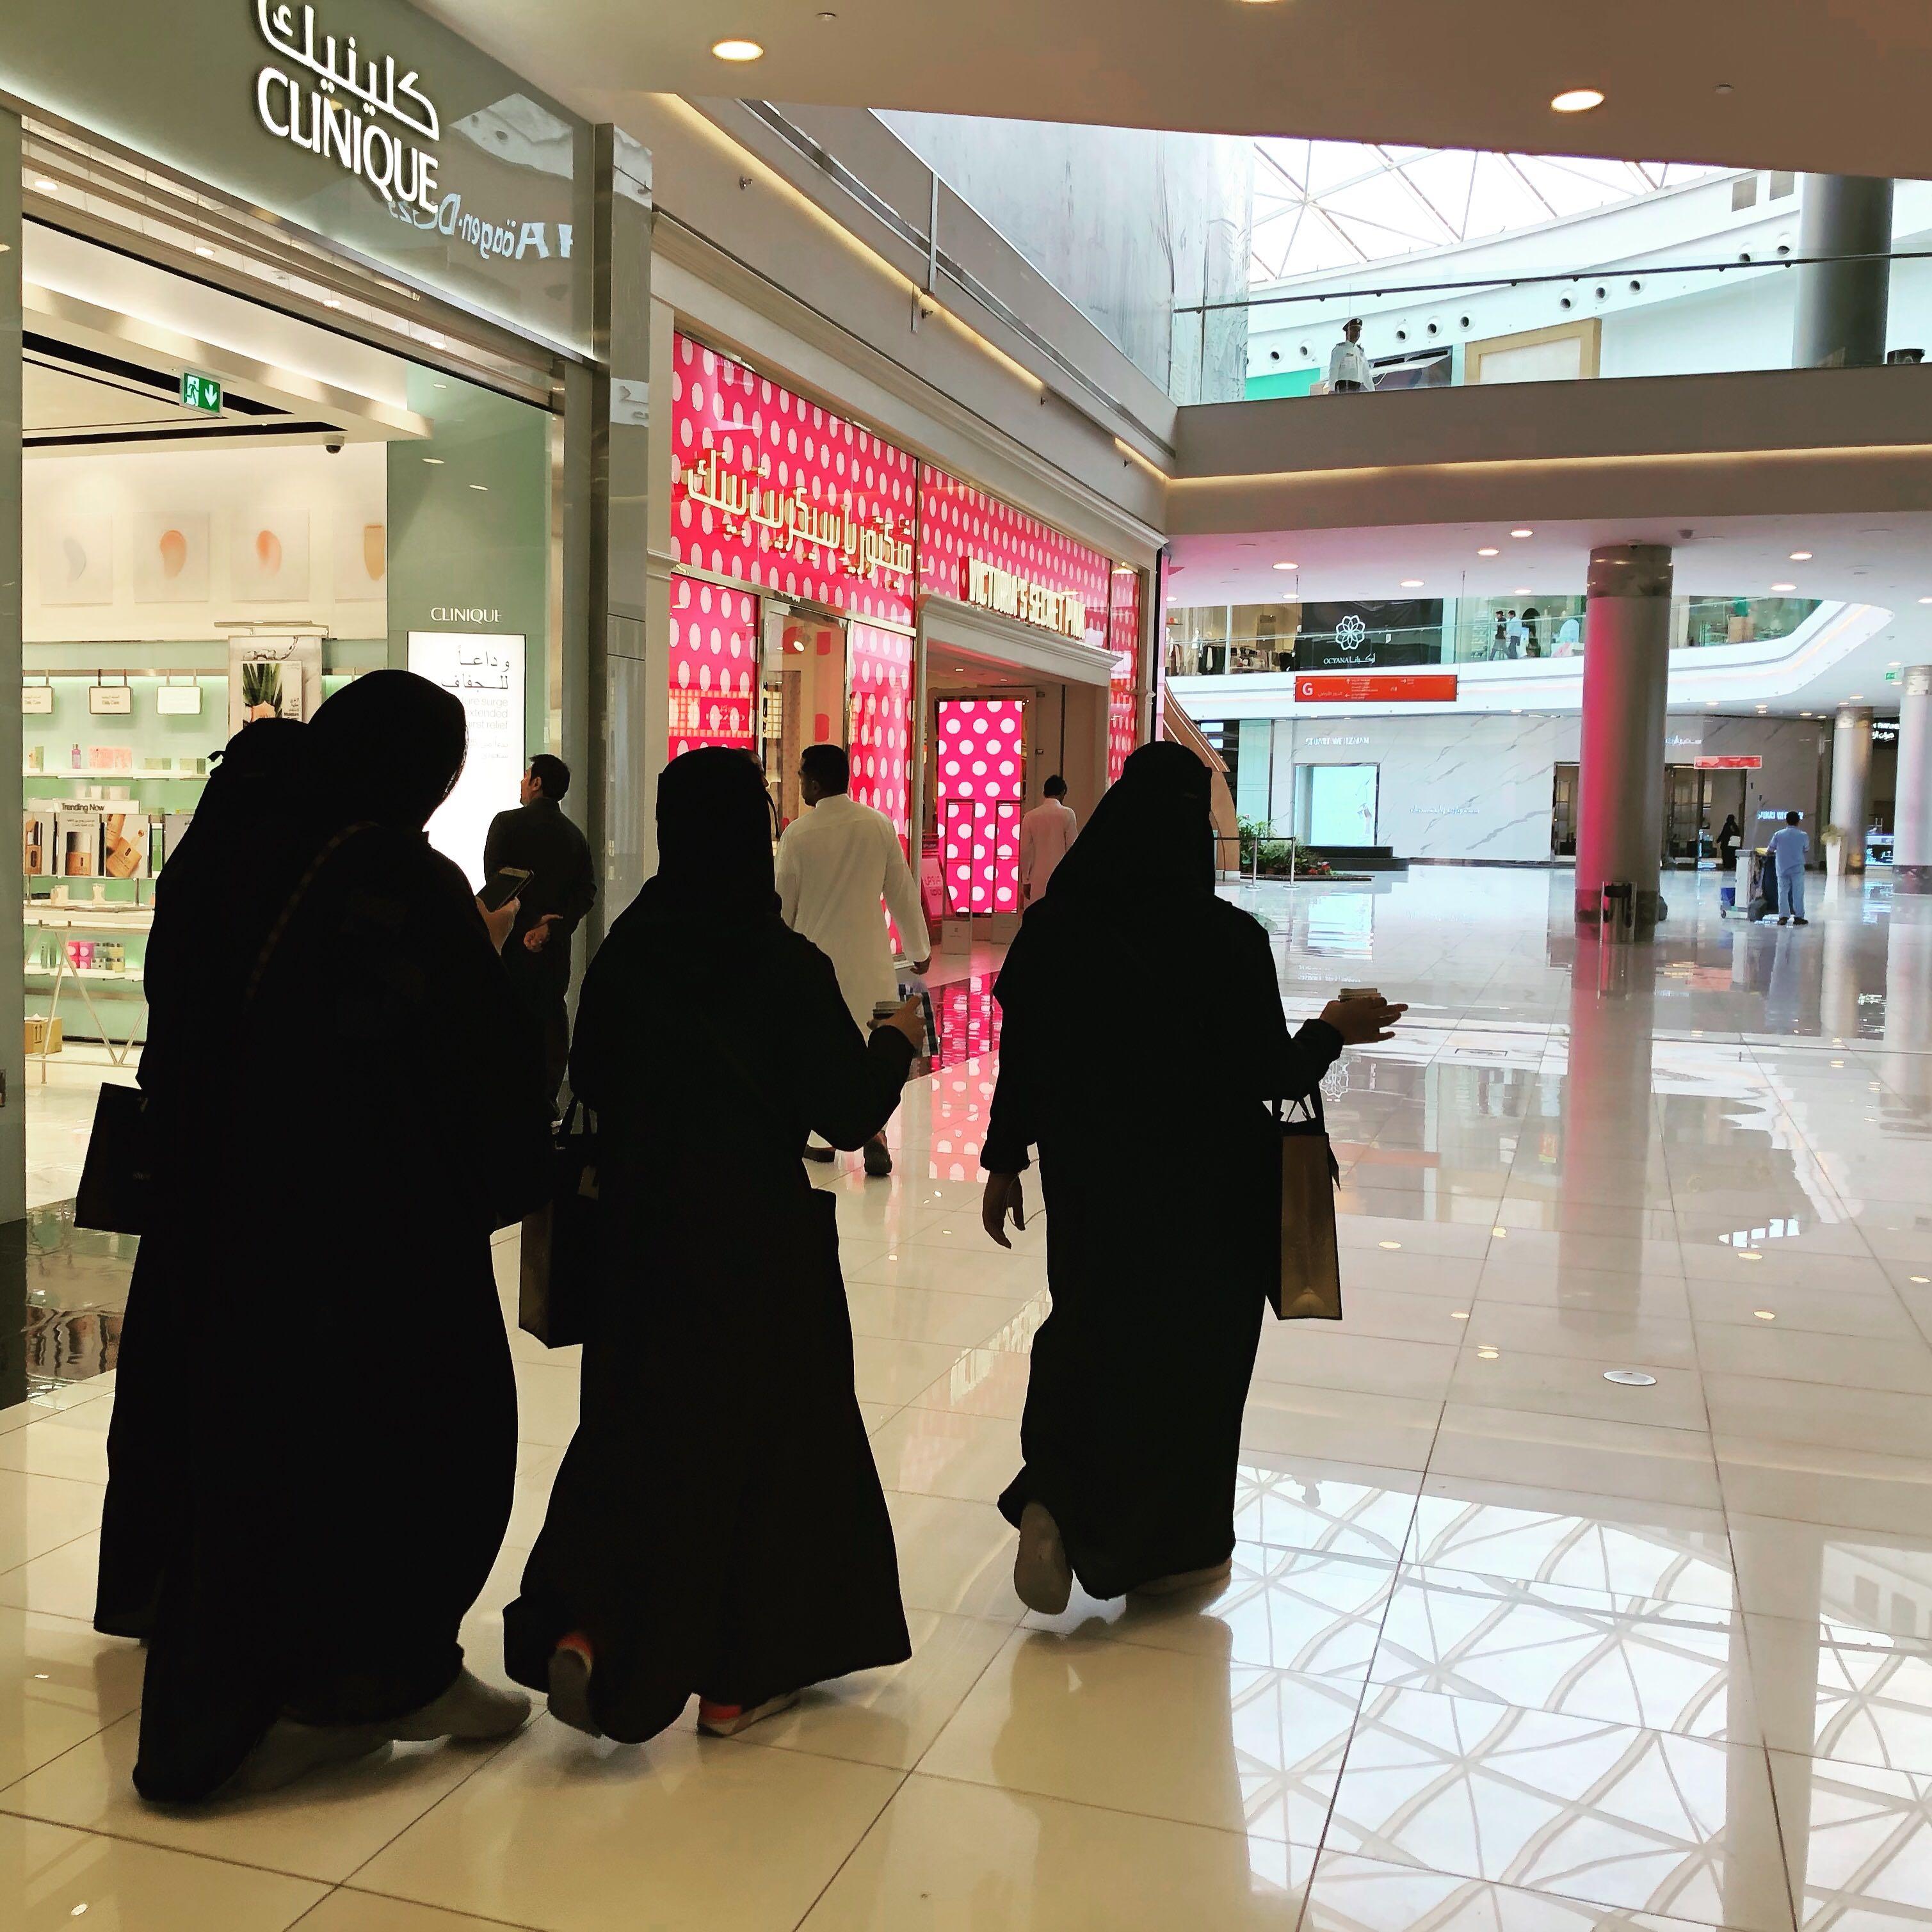 Women wearing black abaya at a mall in Saudi Arabia.